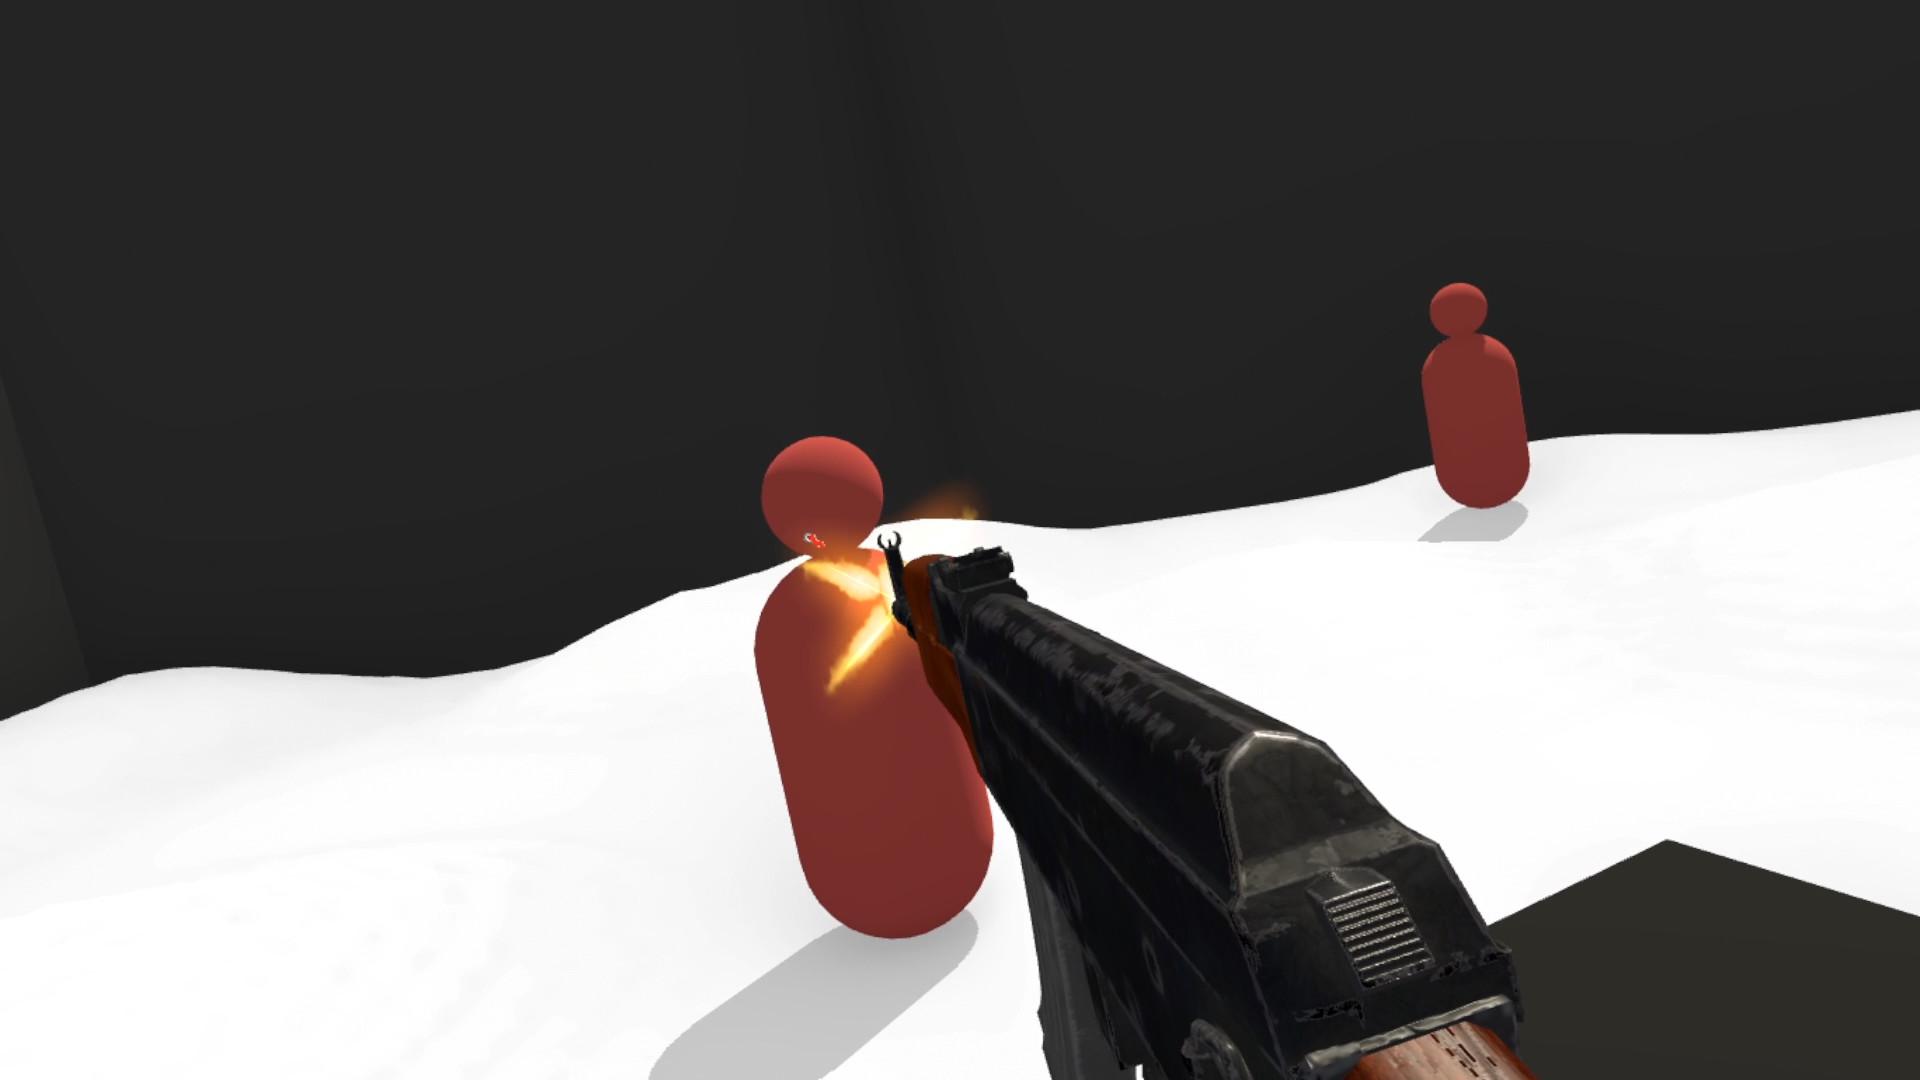 VR Aim Trainer Free Download